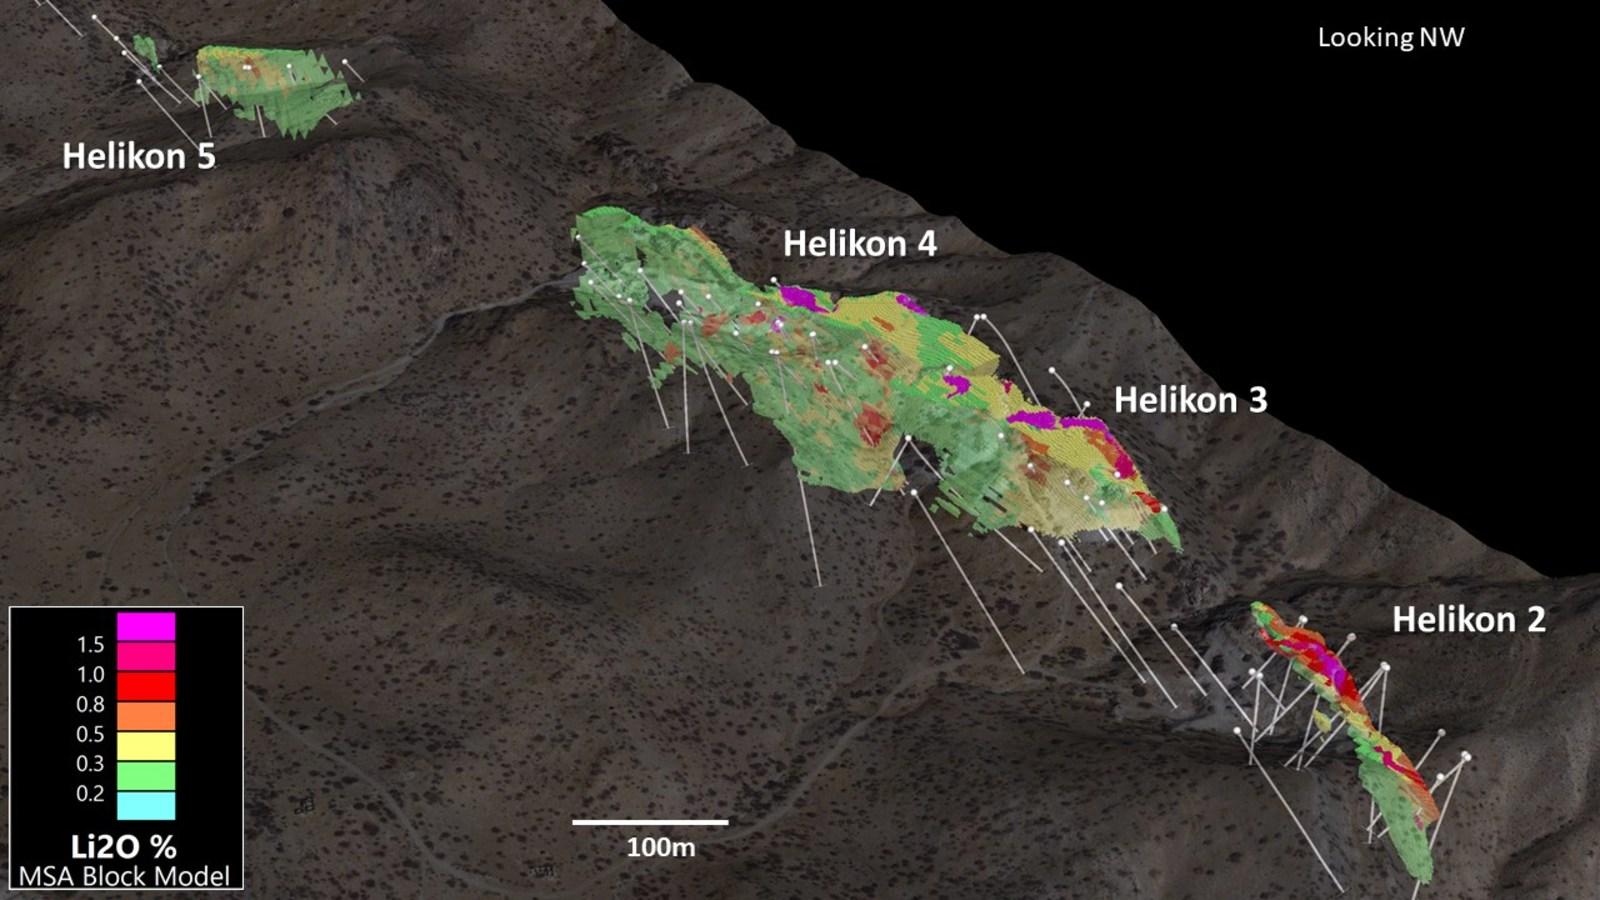 Figure 5. 3D View of Helikon 2 - 5